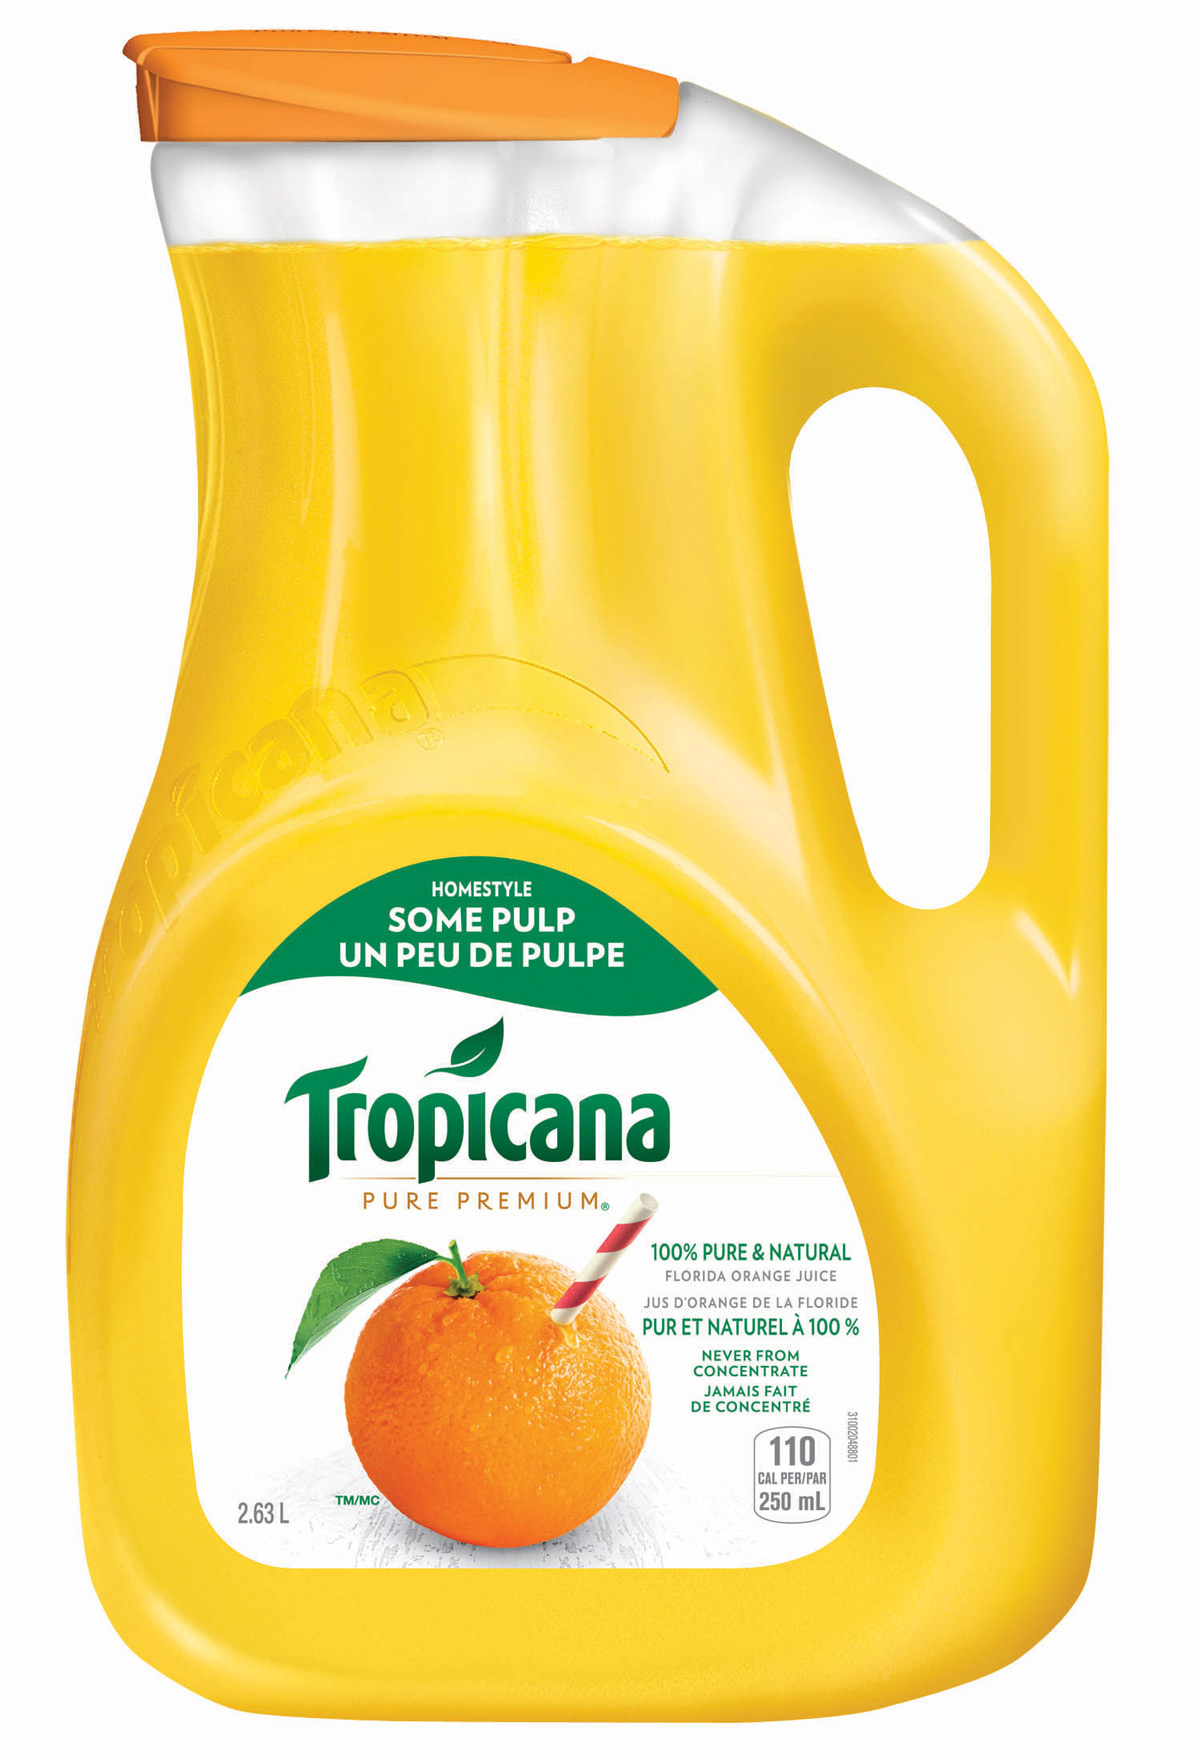 Tropicana Pure Premium® Homestyle